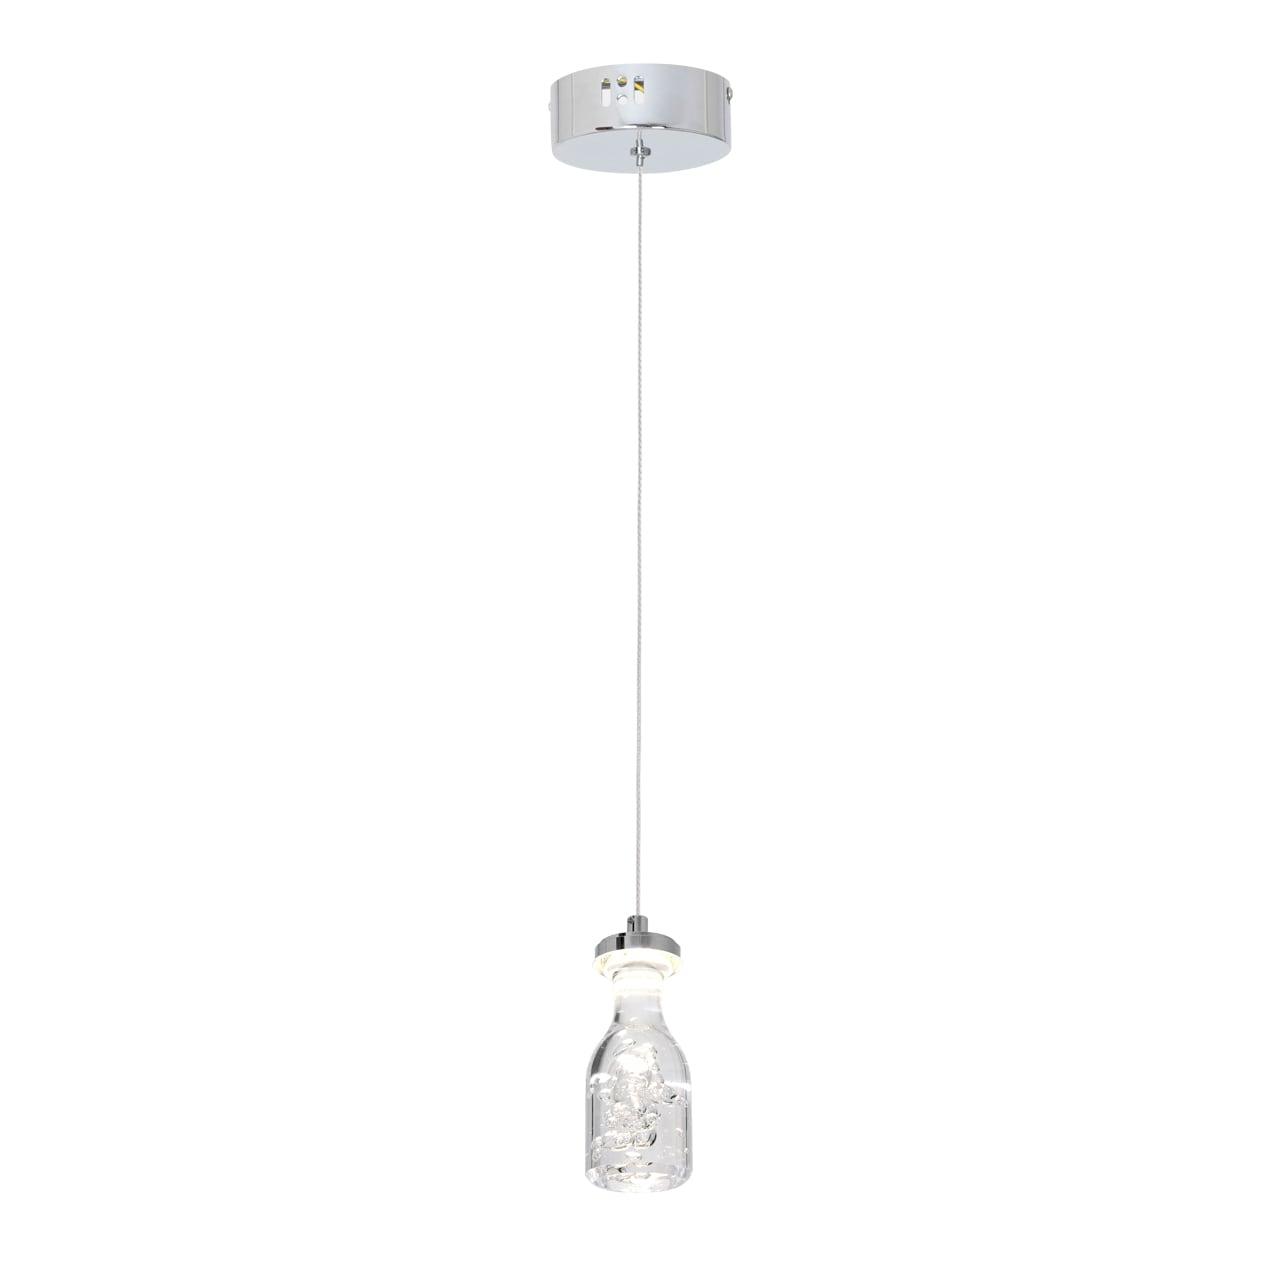 Lampa suspendată Milagro BOTTLE 431 Chrom 5W